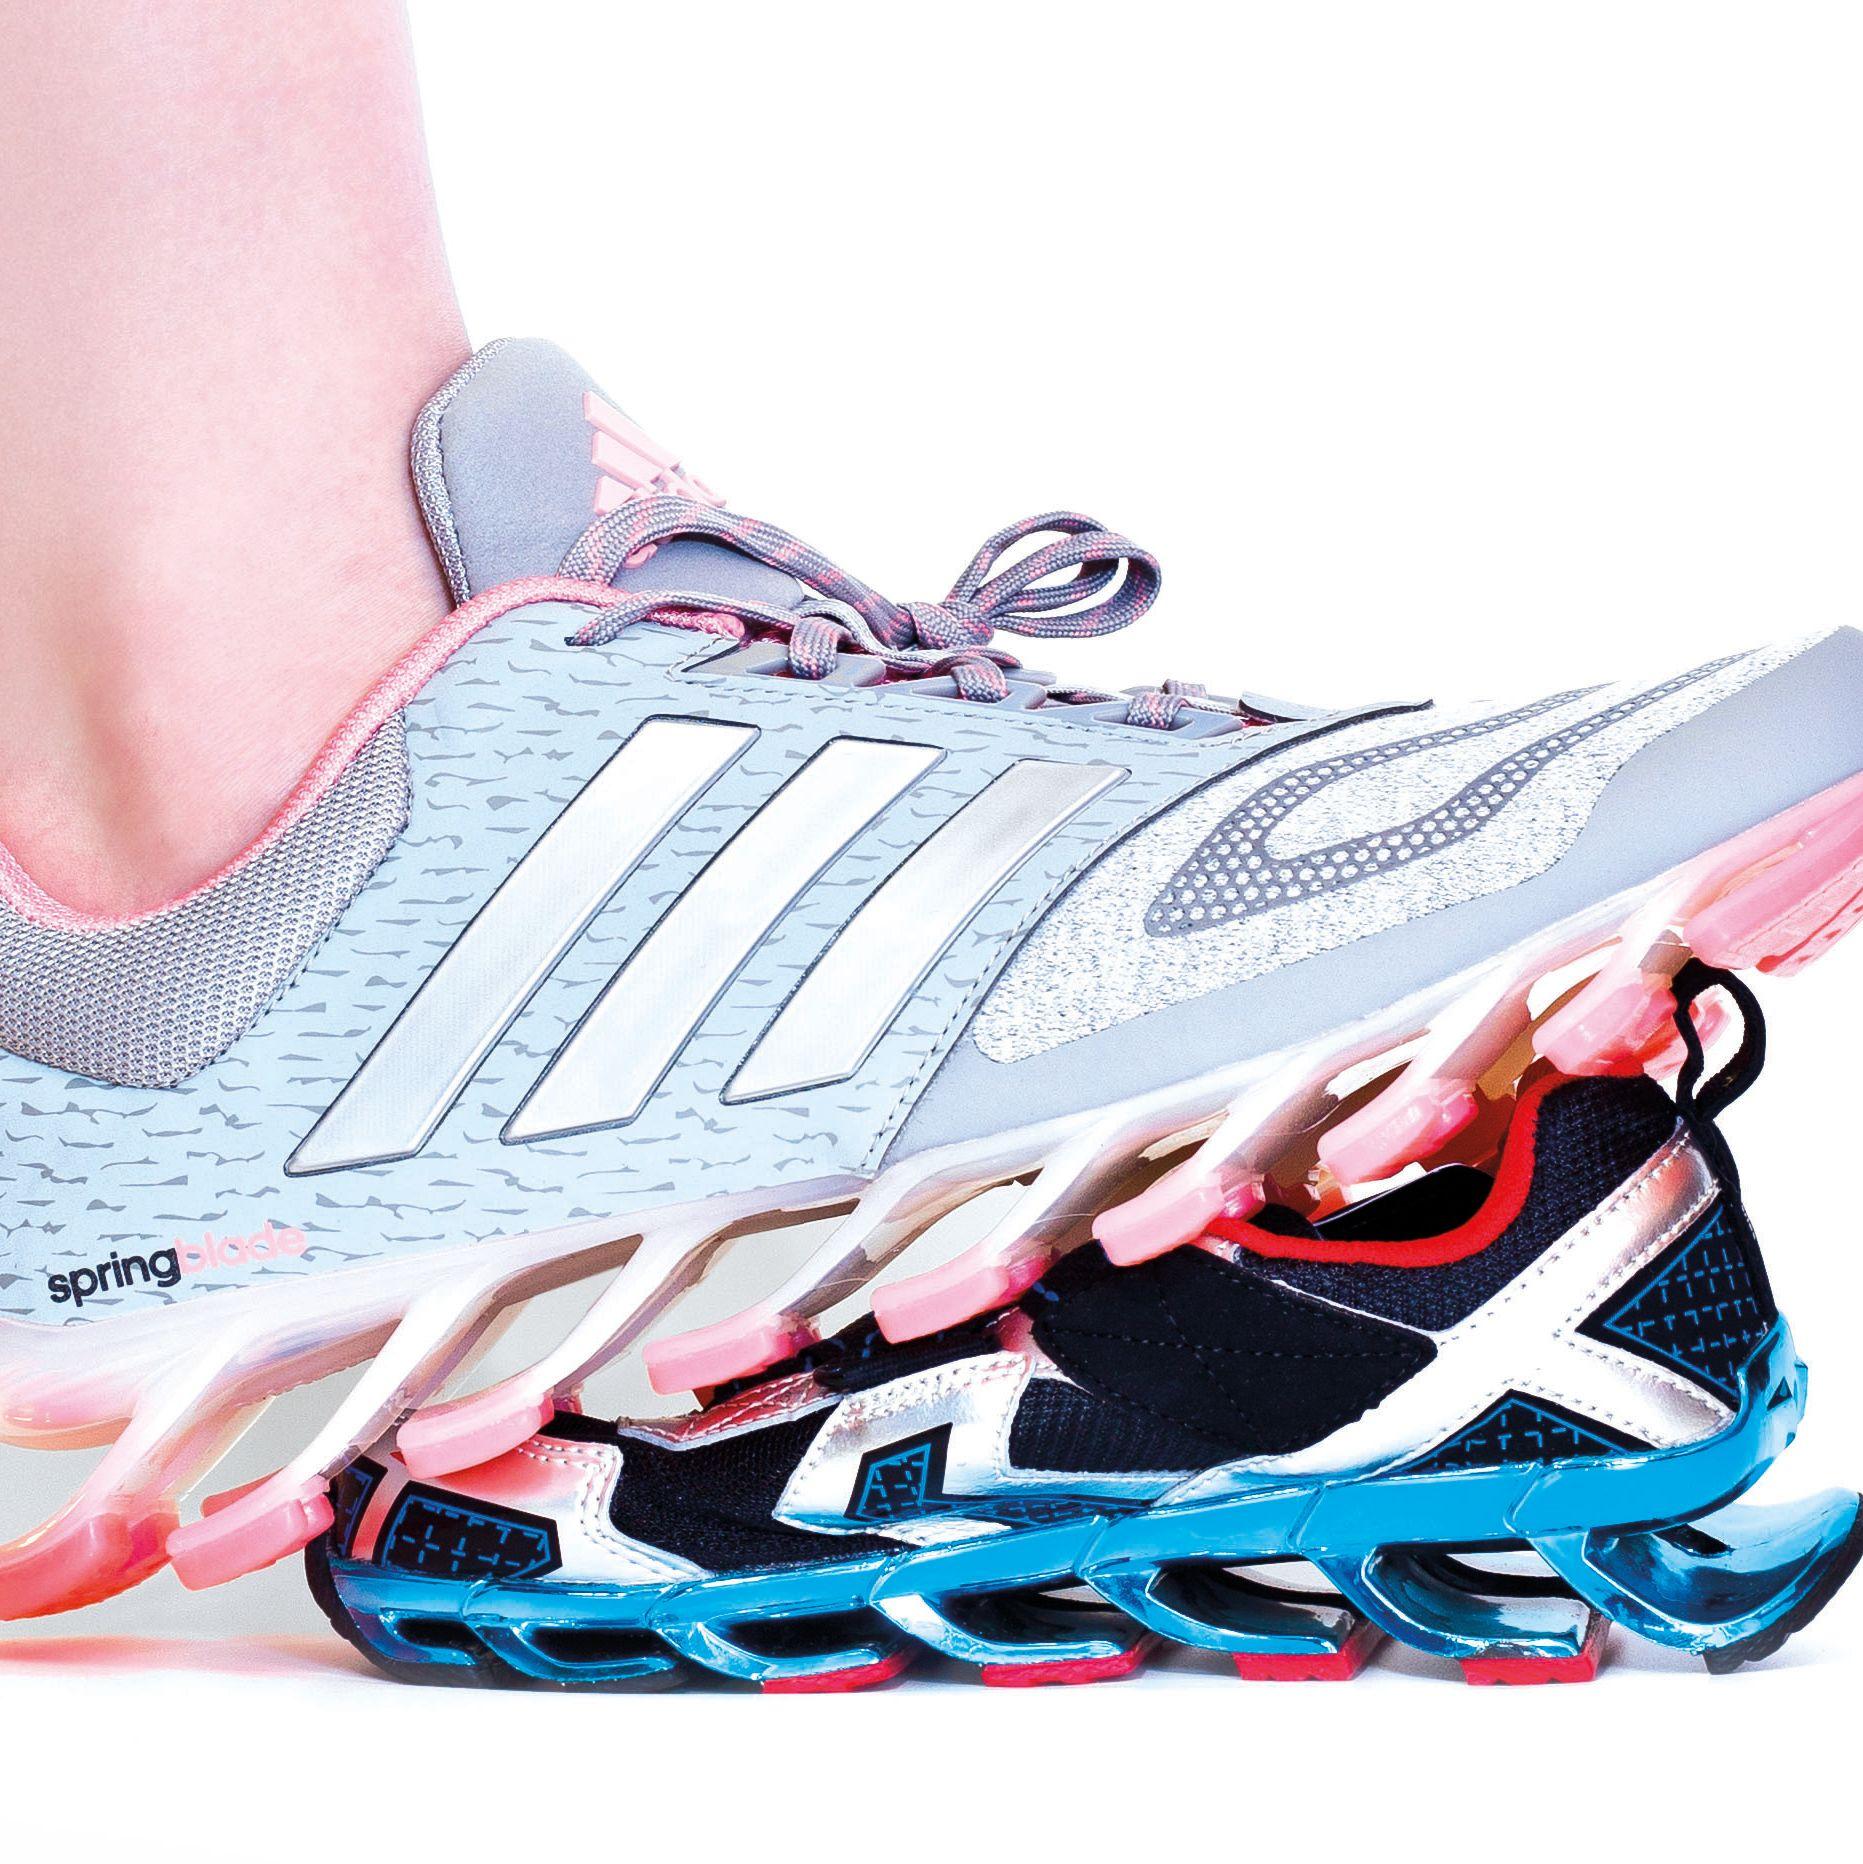 Pomo 1016 shoe wars adidas o9p1d0